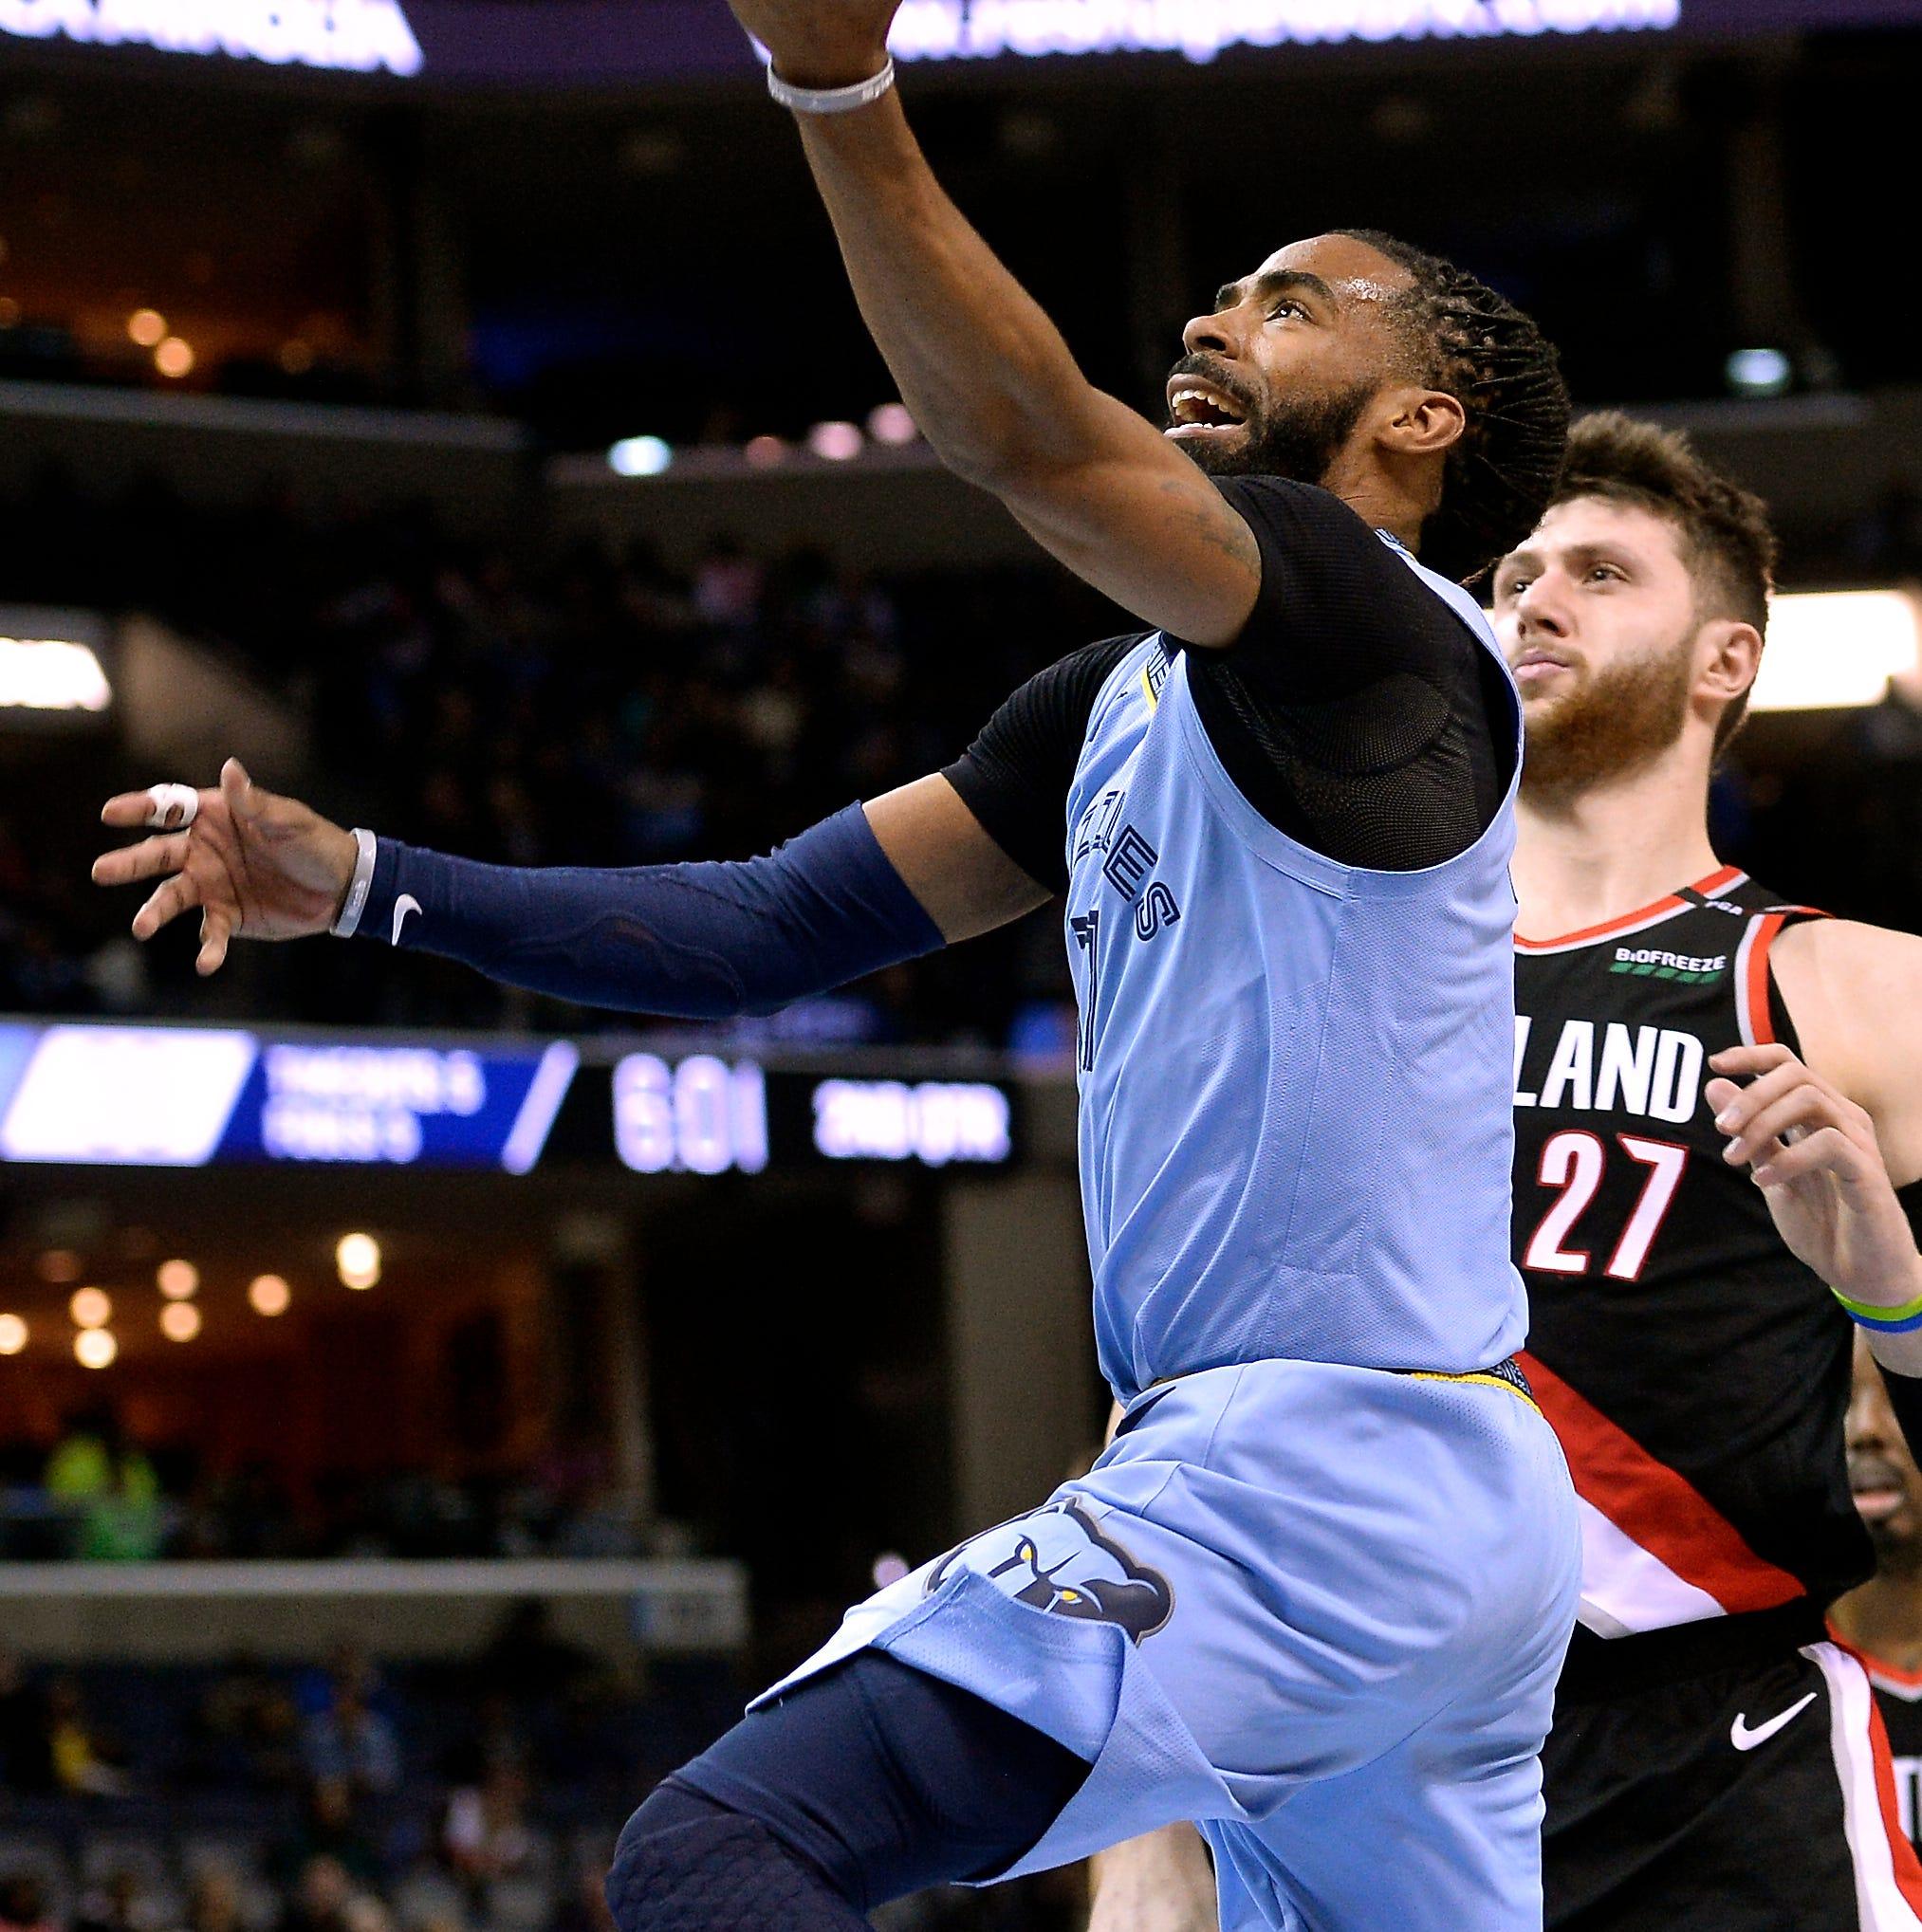 Game Recap: Memphis Grizzlies 120, Portland Trail Blazers 111